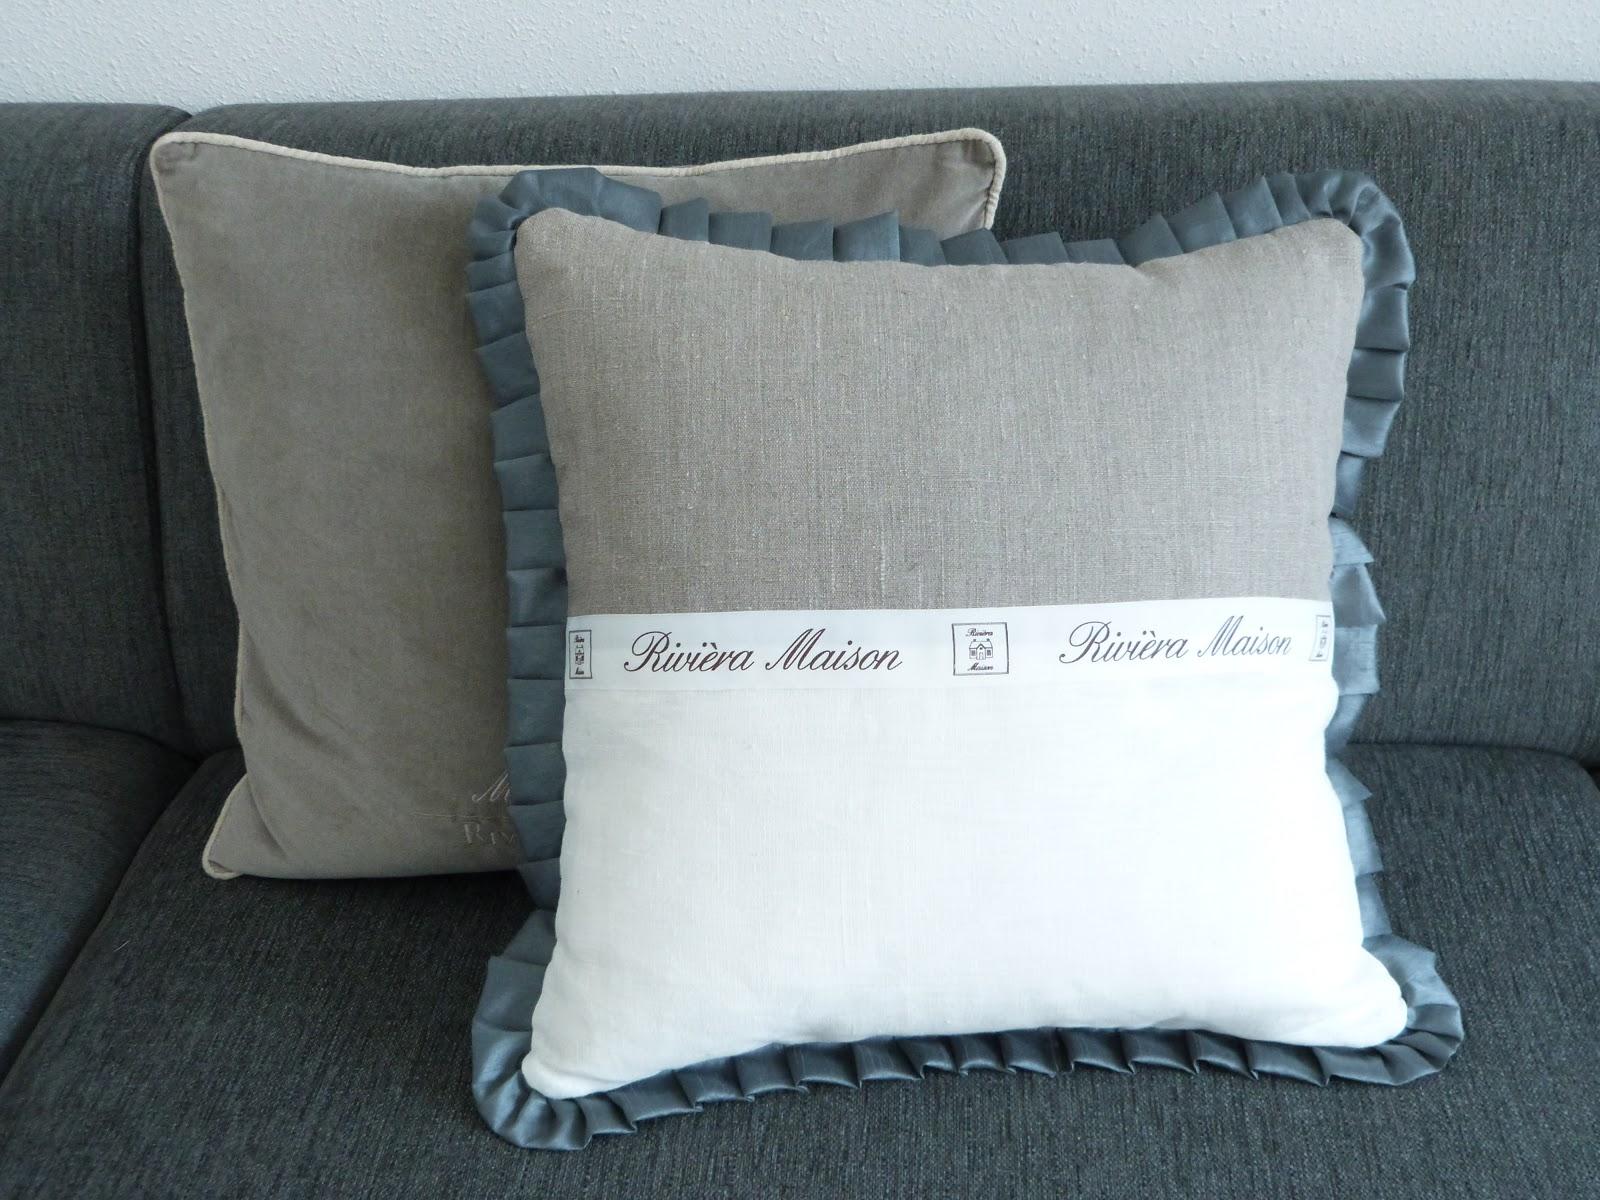 Riviera Maison Kussen : Het brocante schelpenhuisje echt nep riviera maison kussen